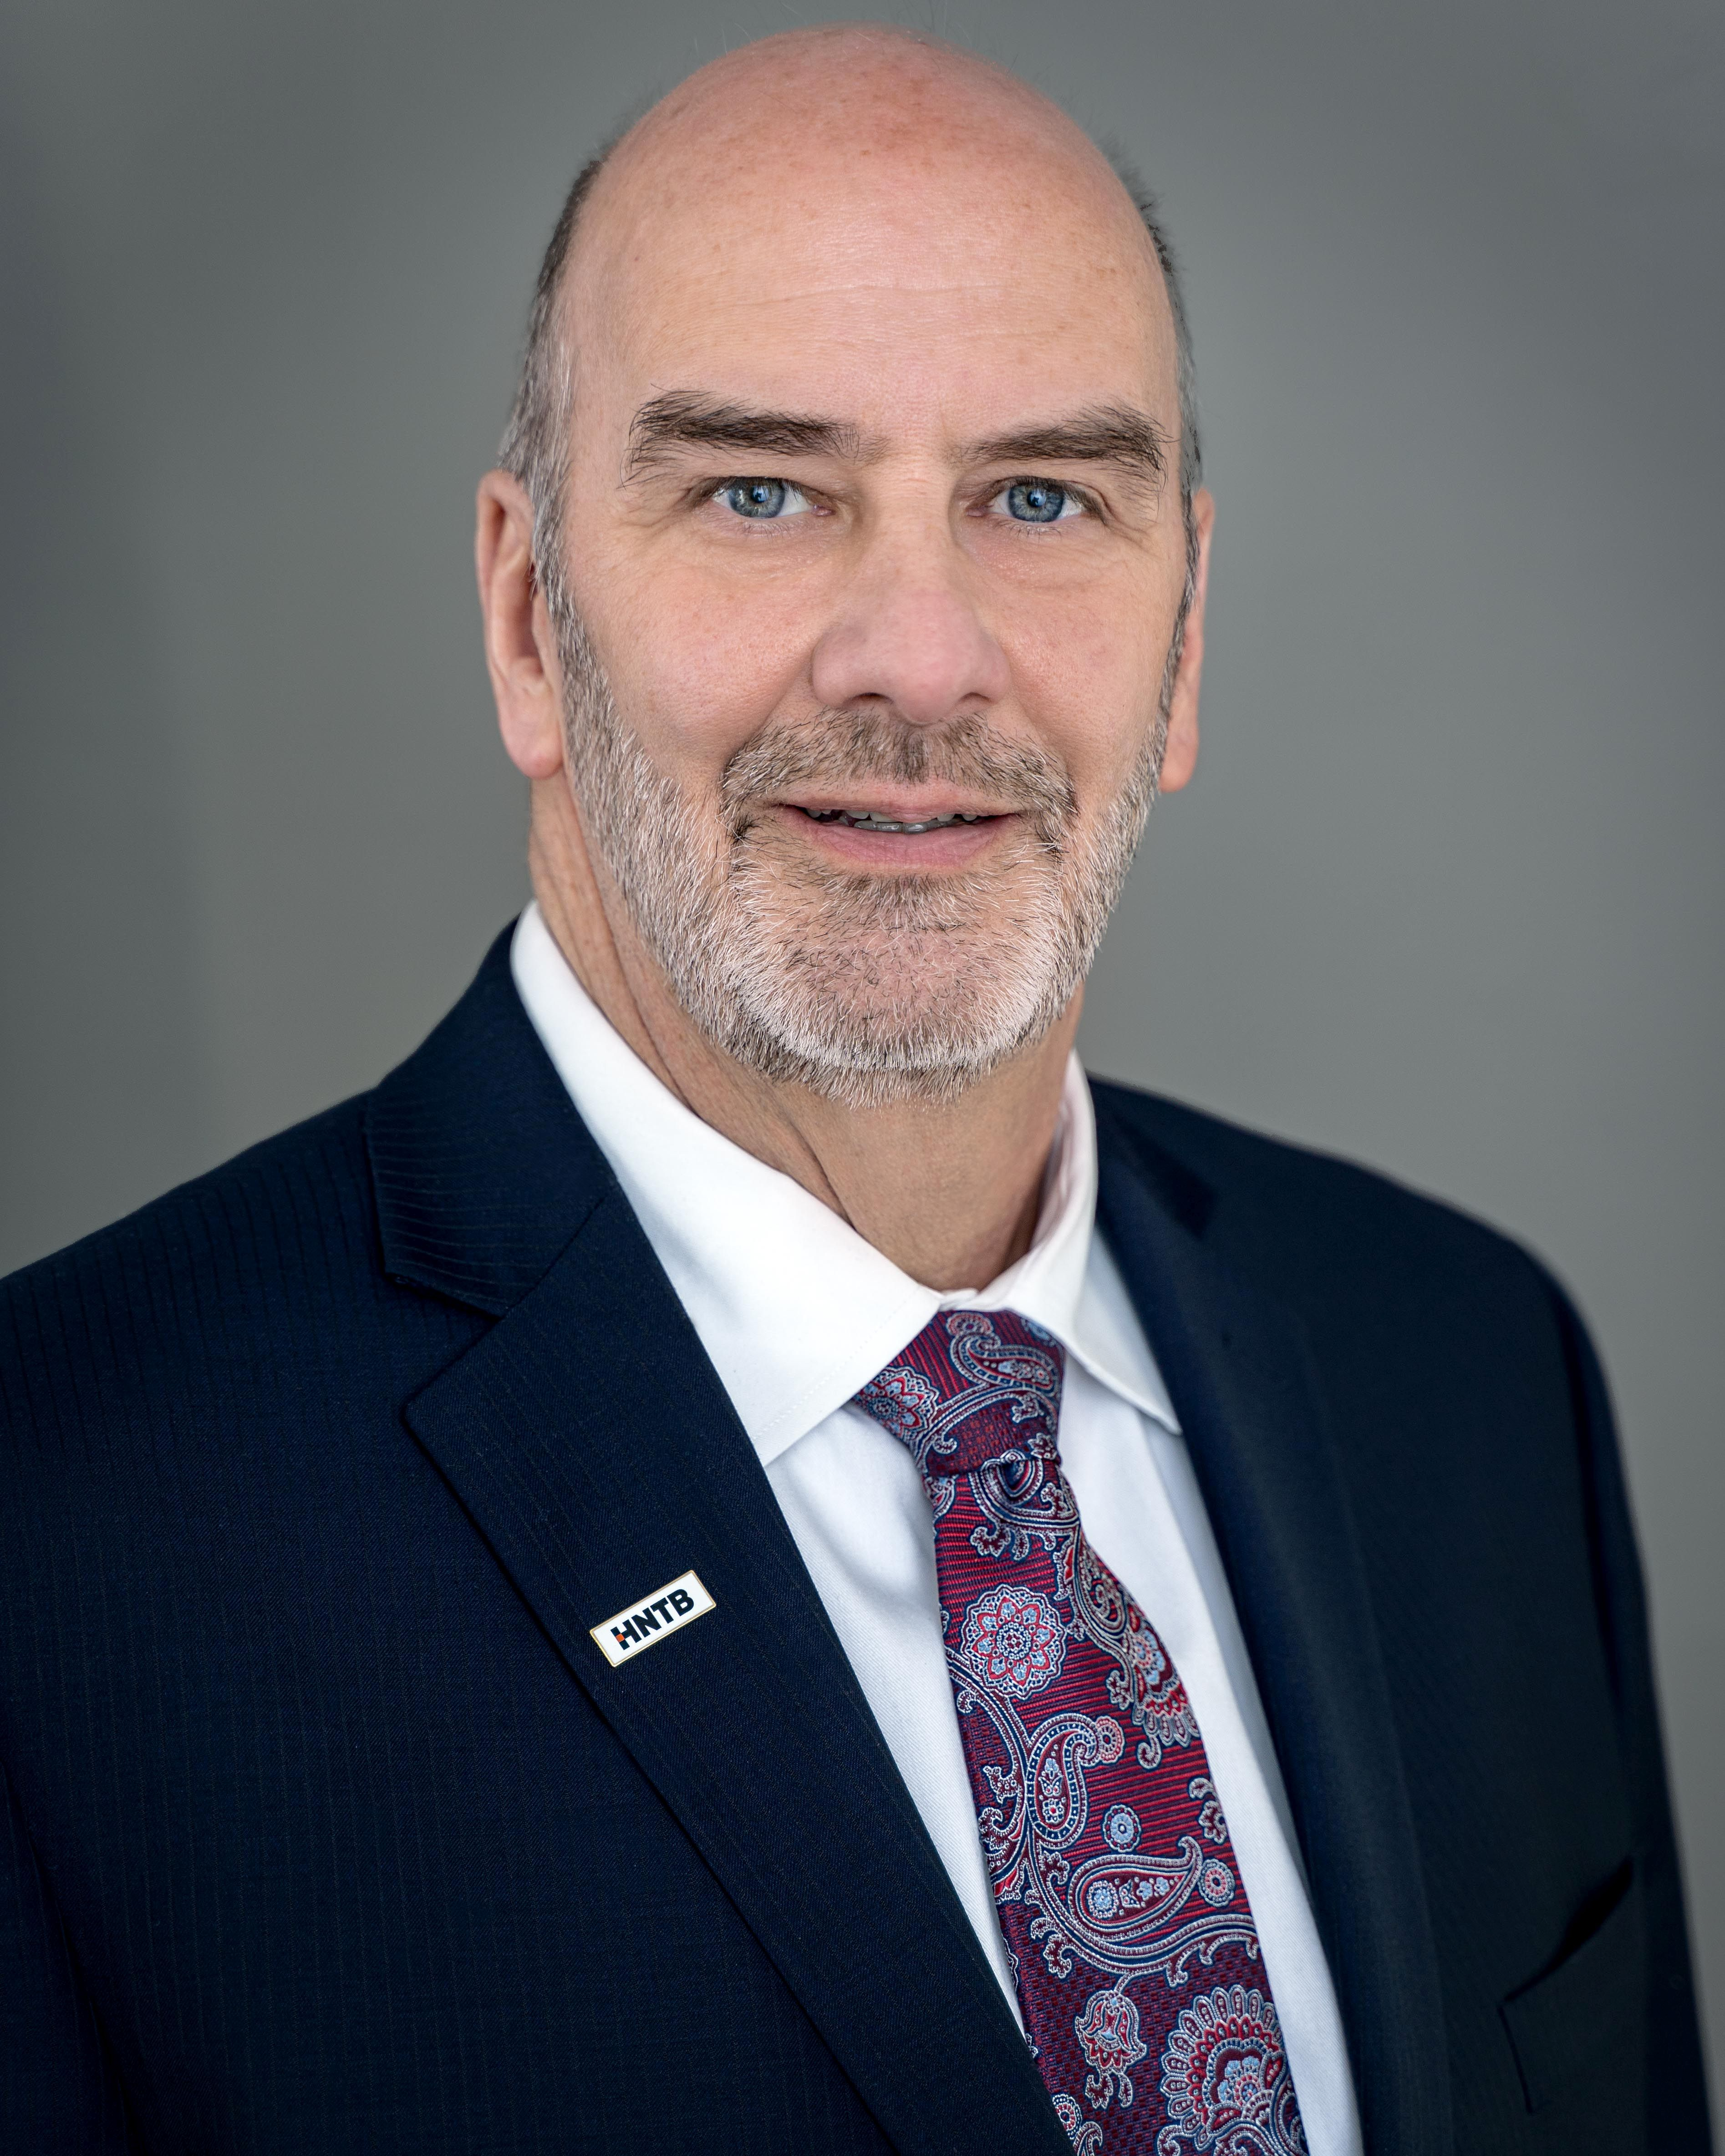 Rail transit expert Mangold joins HNTB as rail program manager